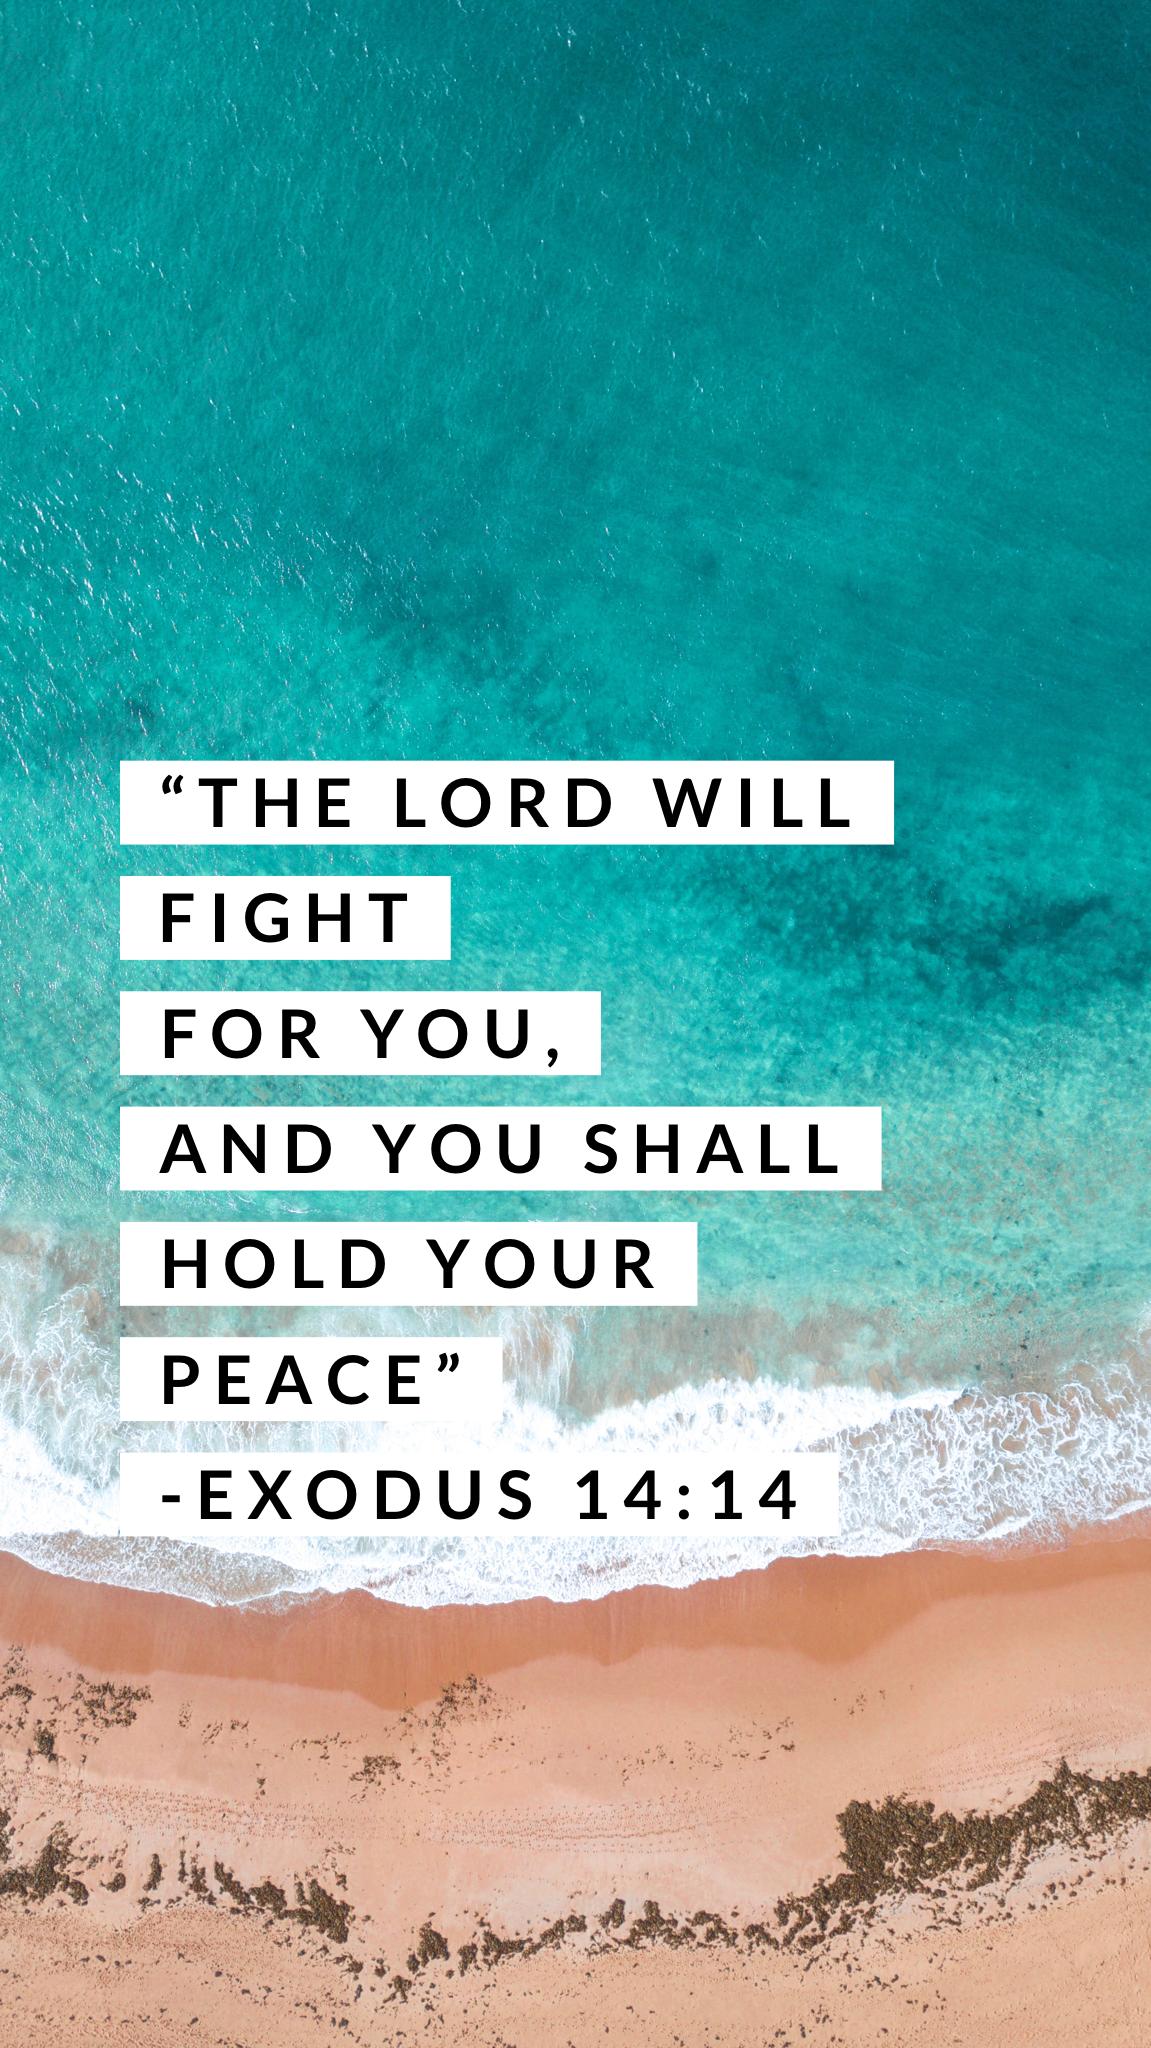 Exodus 14:14 NKJV scripture wallpaper ocean summer || the